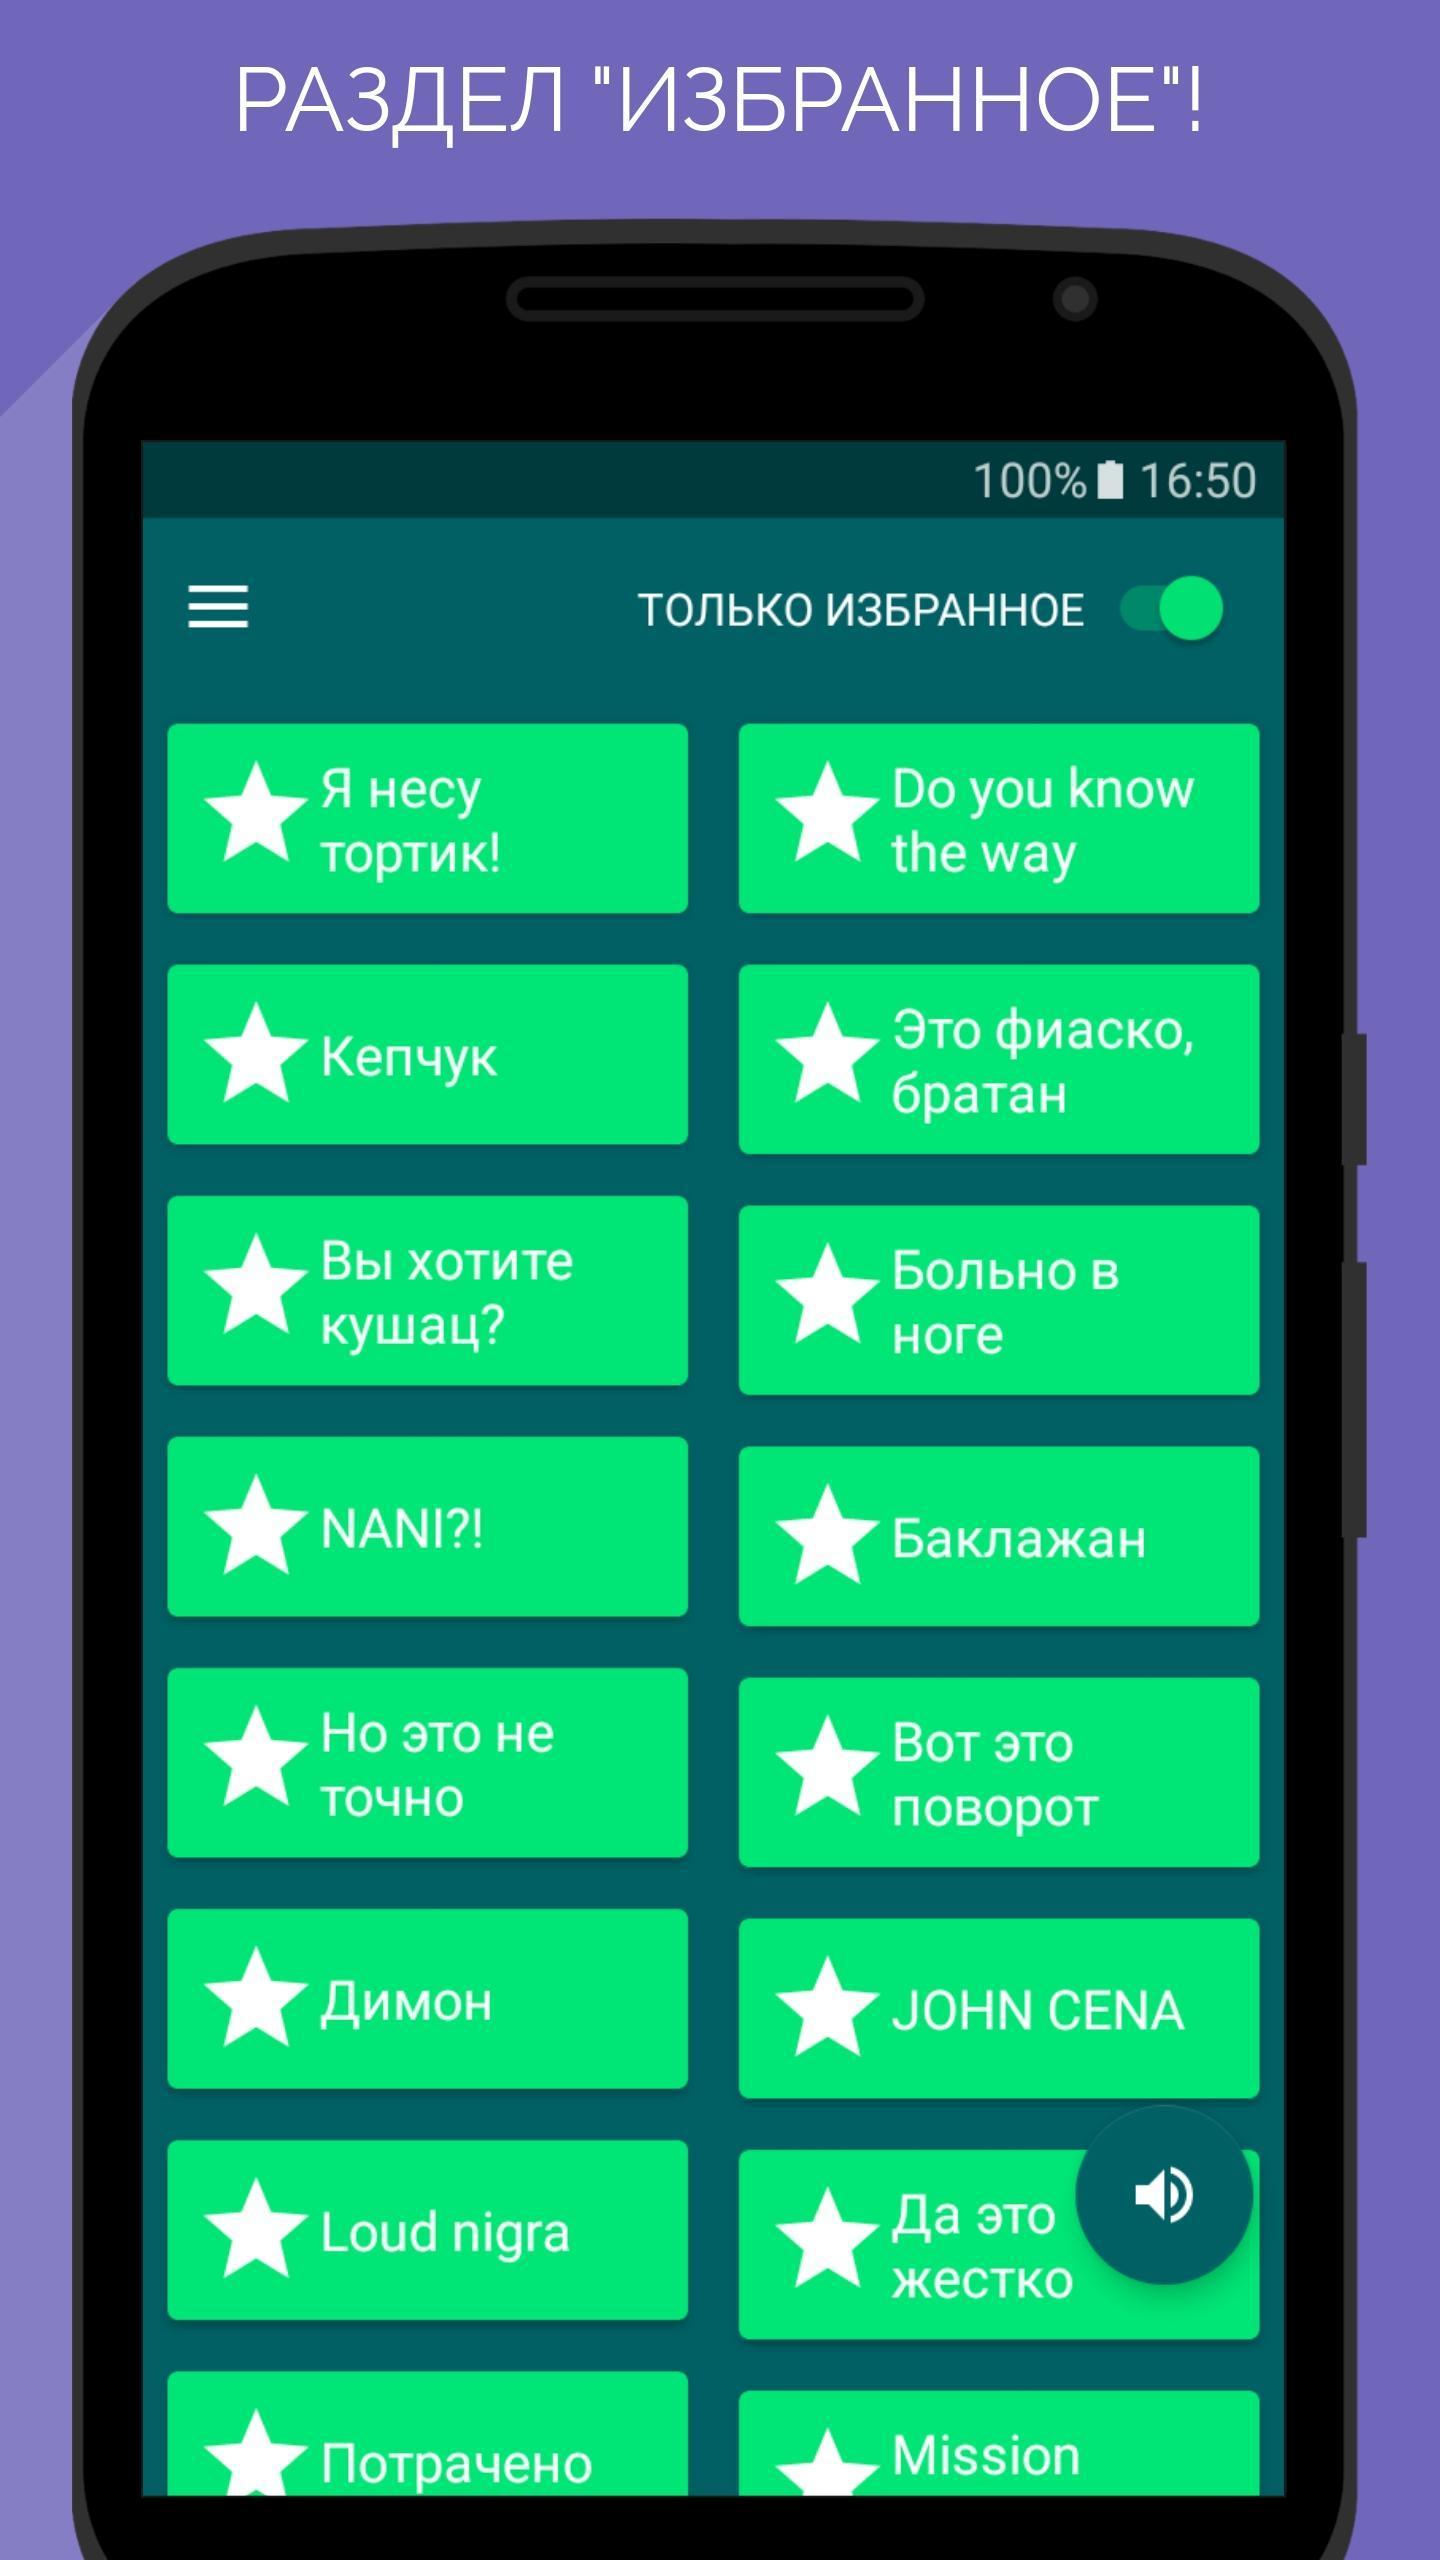 Russian Meme Soundboard  Звуки, мемы, приколы 2018 cho